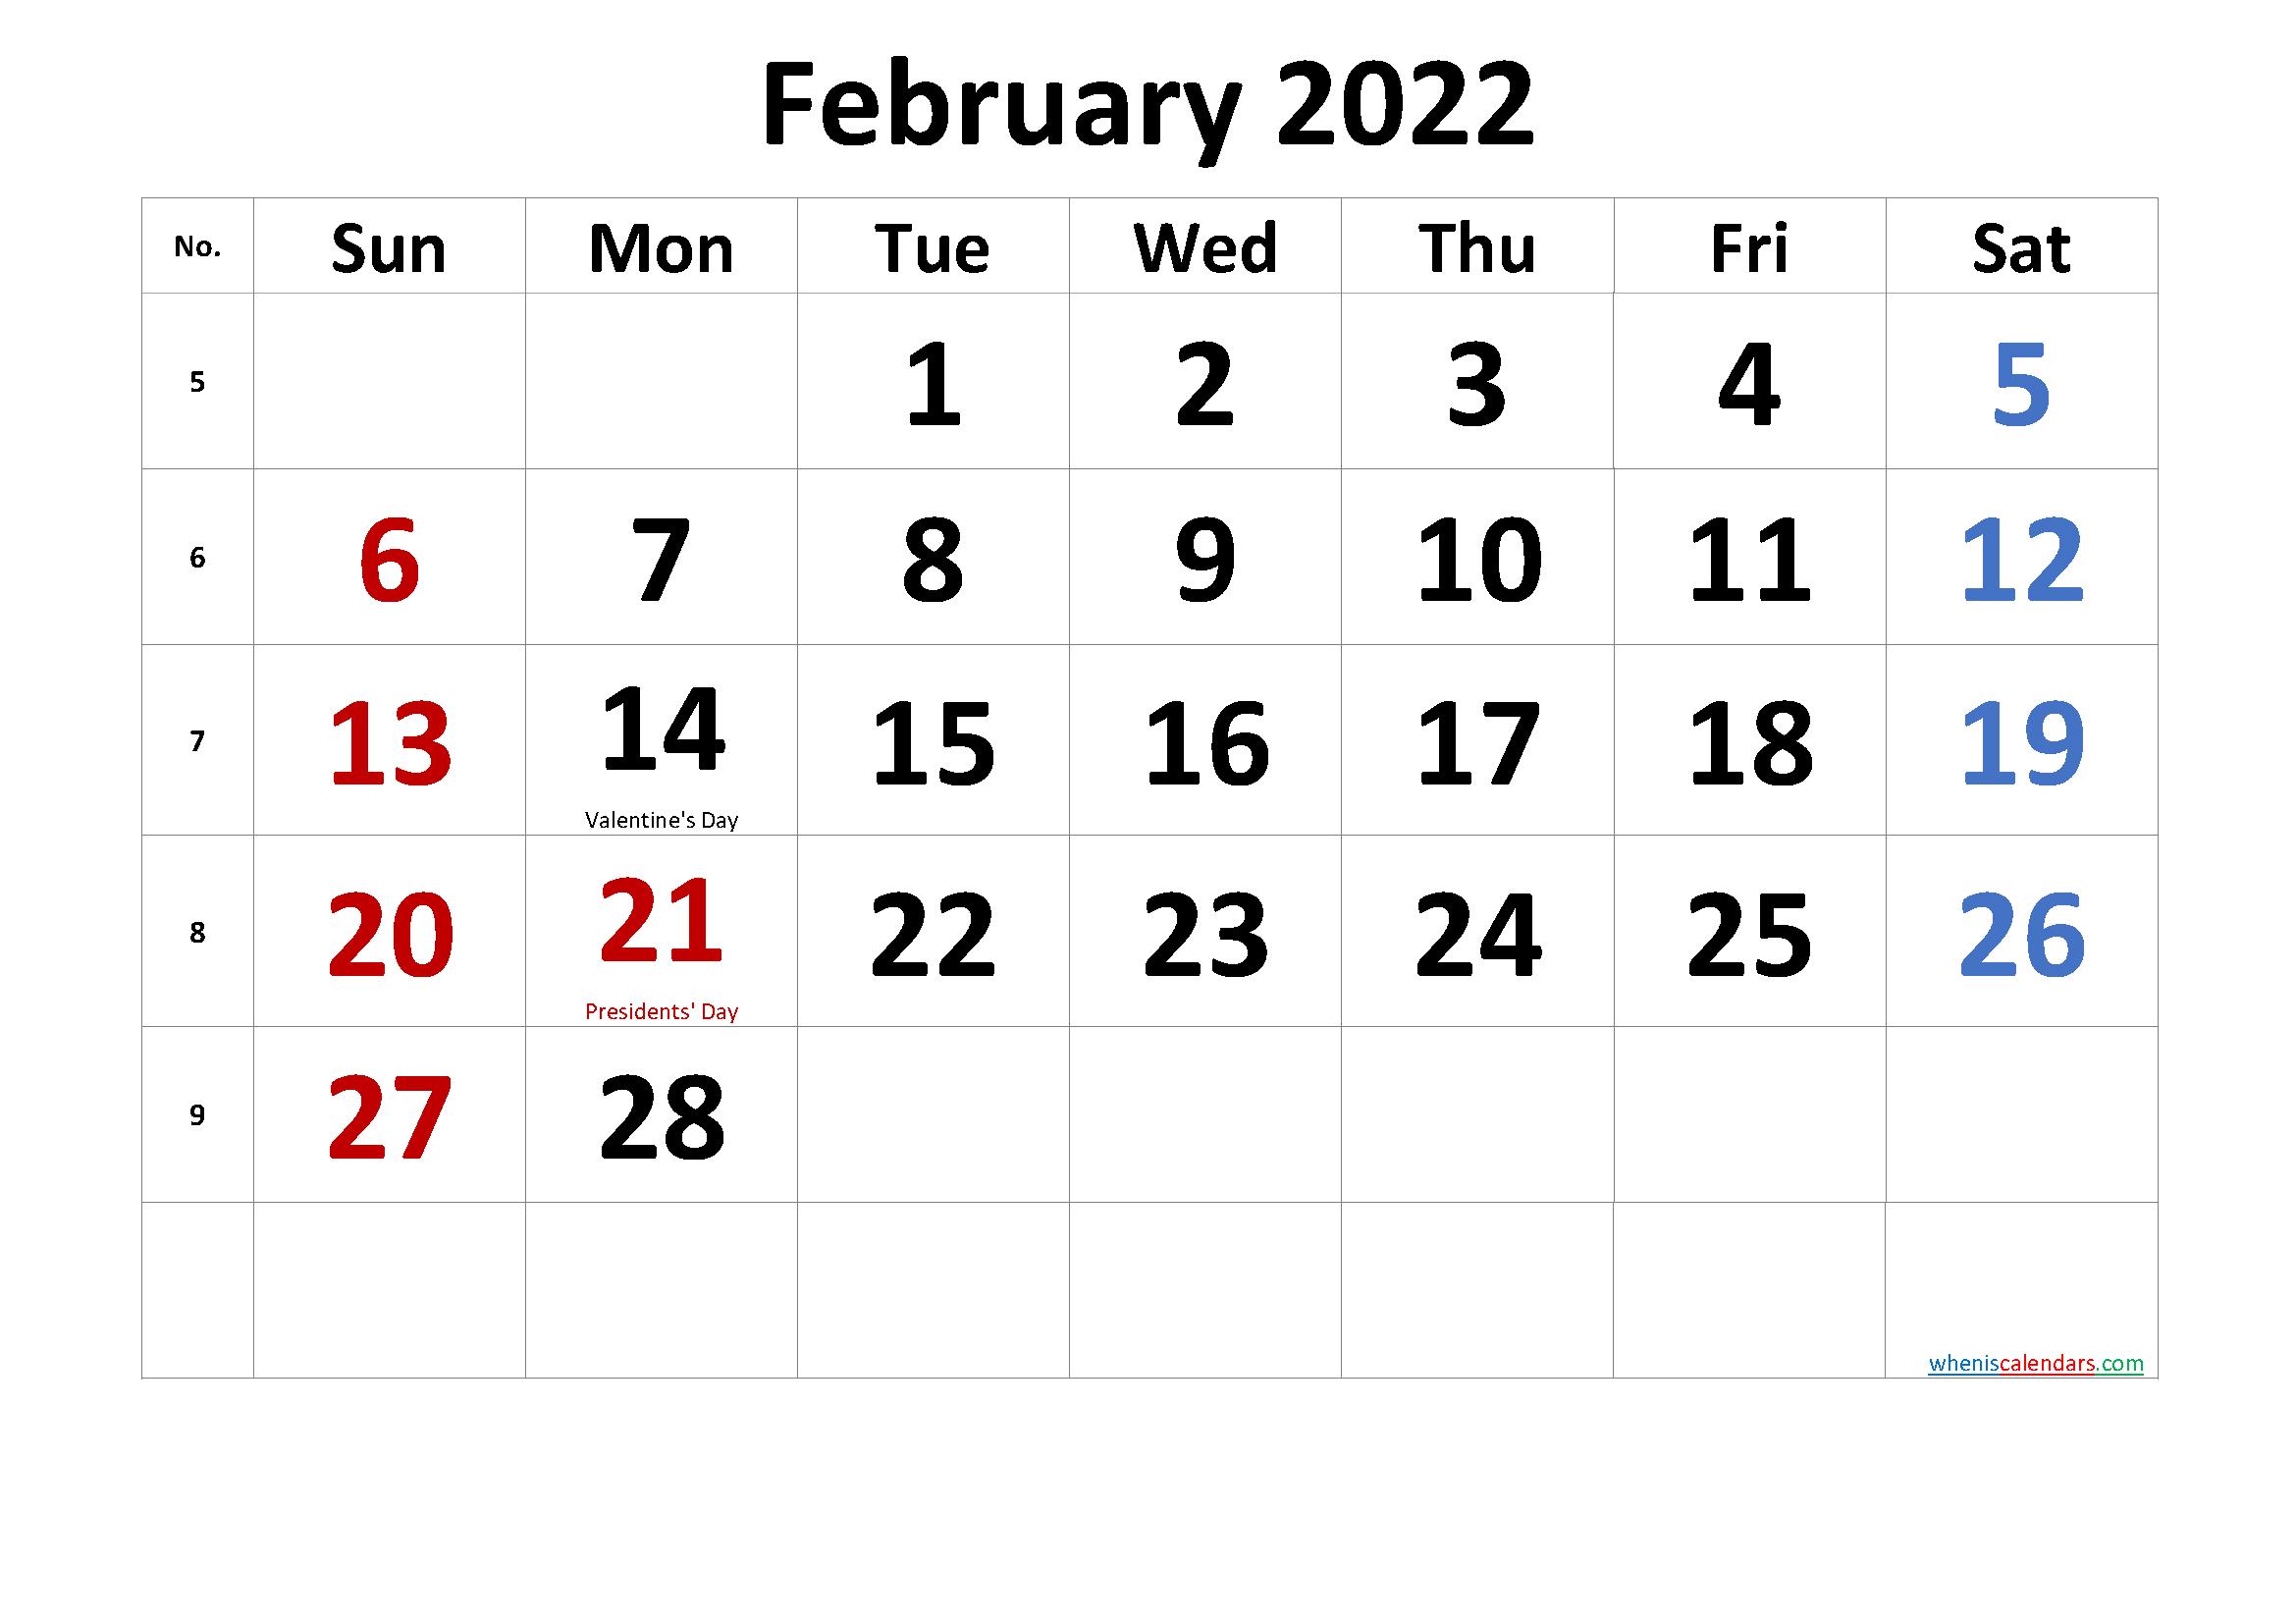 Calendar Feb 2022 Printable.Free Printable February 2022 Calendar Pdf And Png Calendar Printables Printable Calendar Template Calendar Word